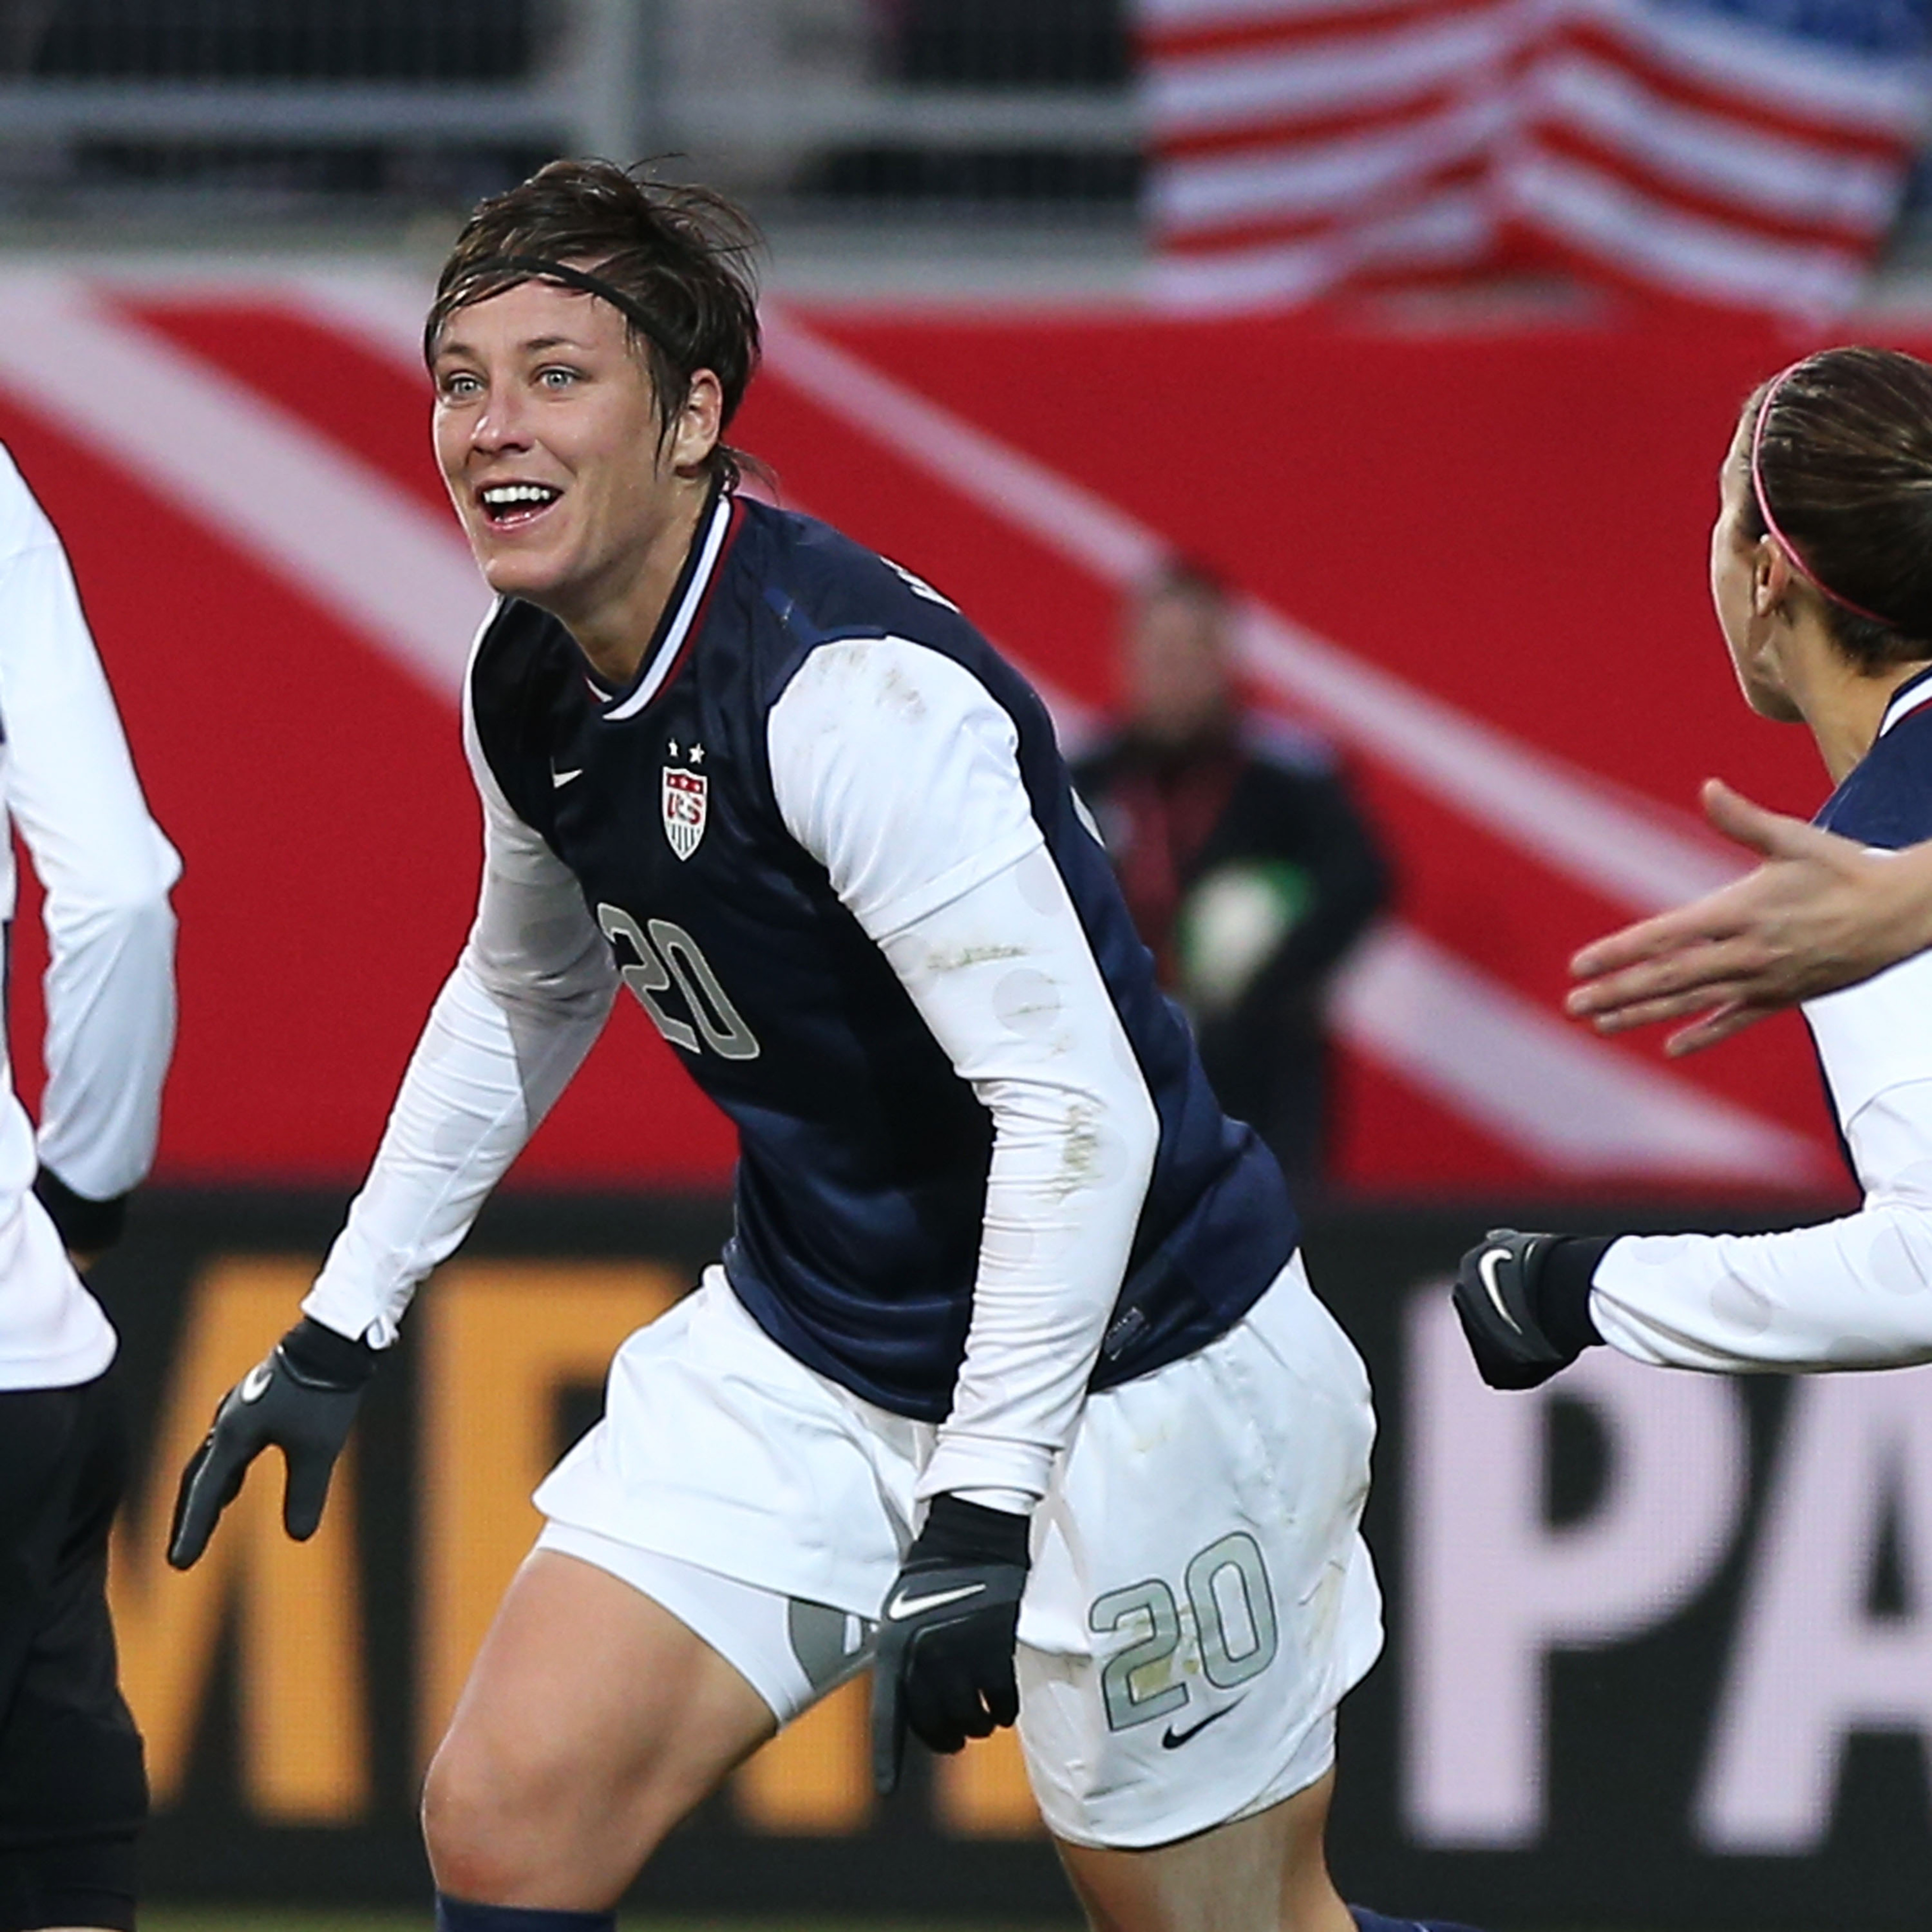 Abby Wambach breaks international goal-scoring record